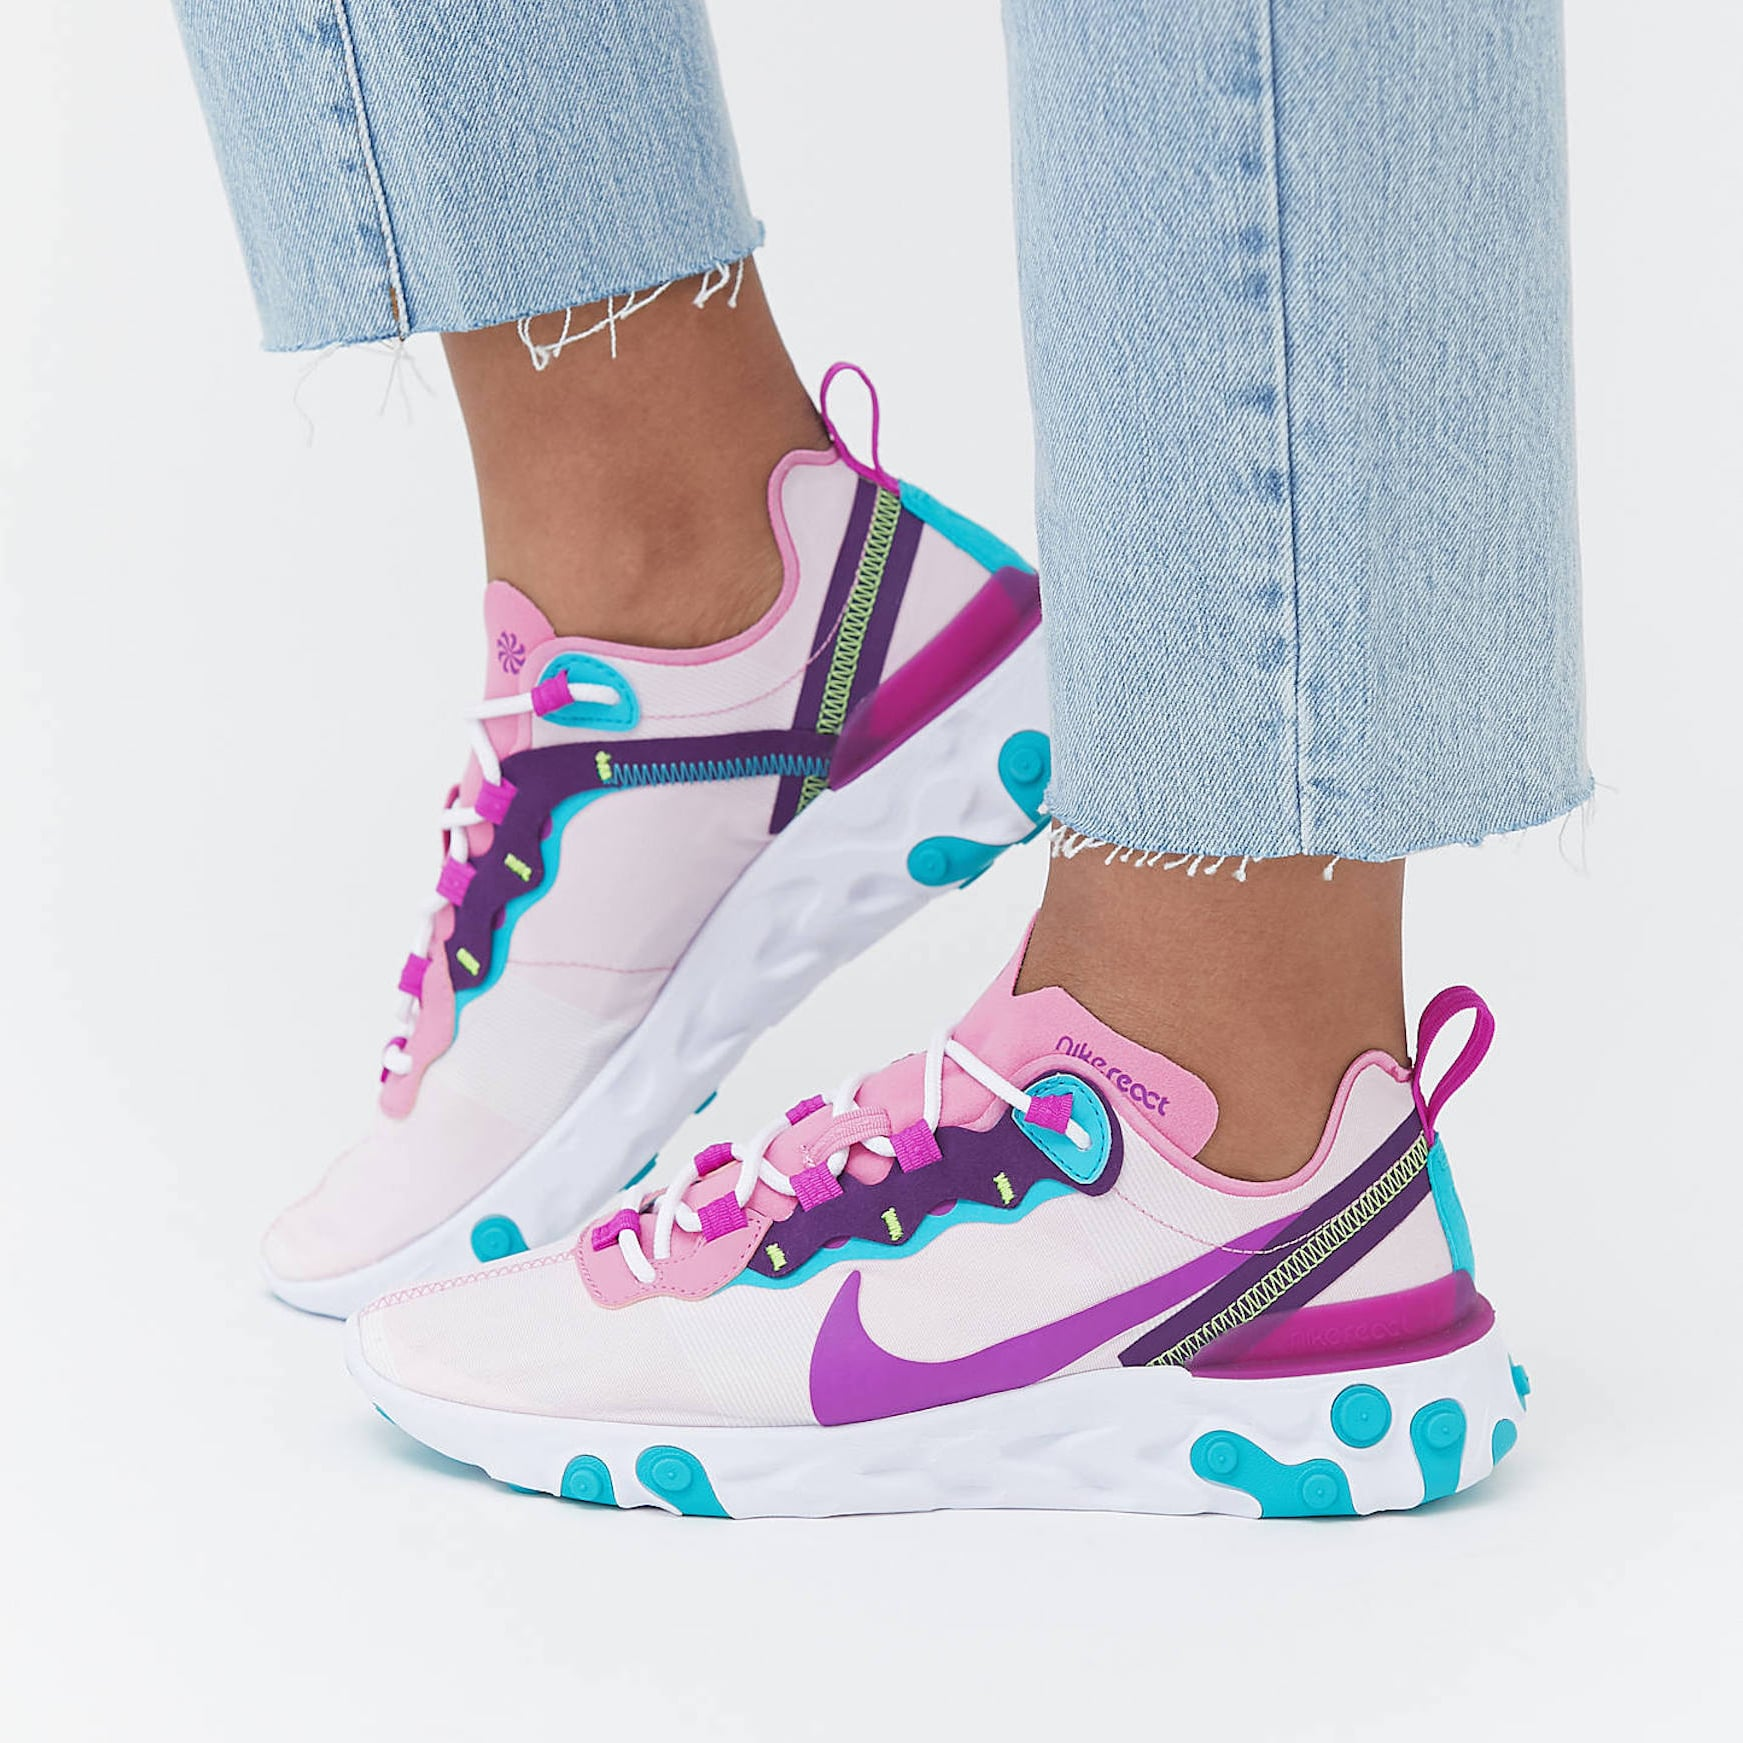 Nike React Pink and Purple Sneakers 2020 | POPSUGAR Fashion